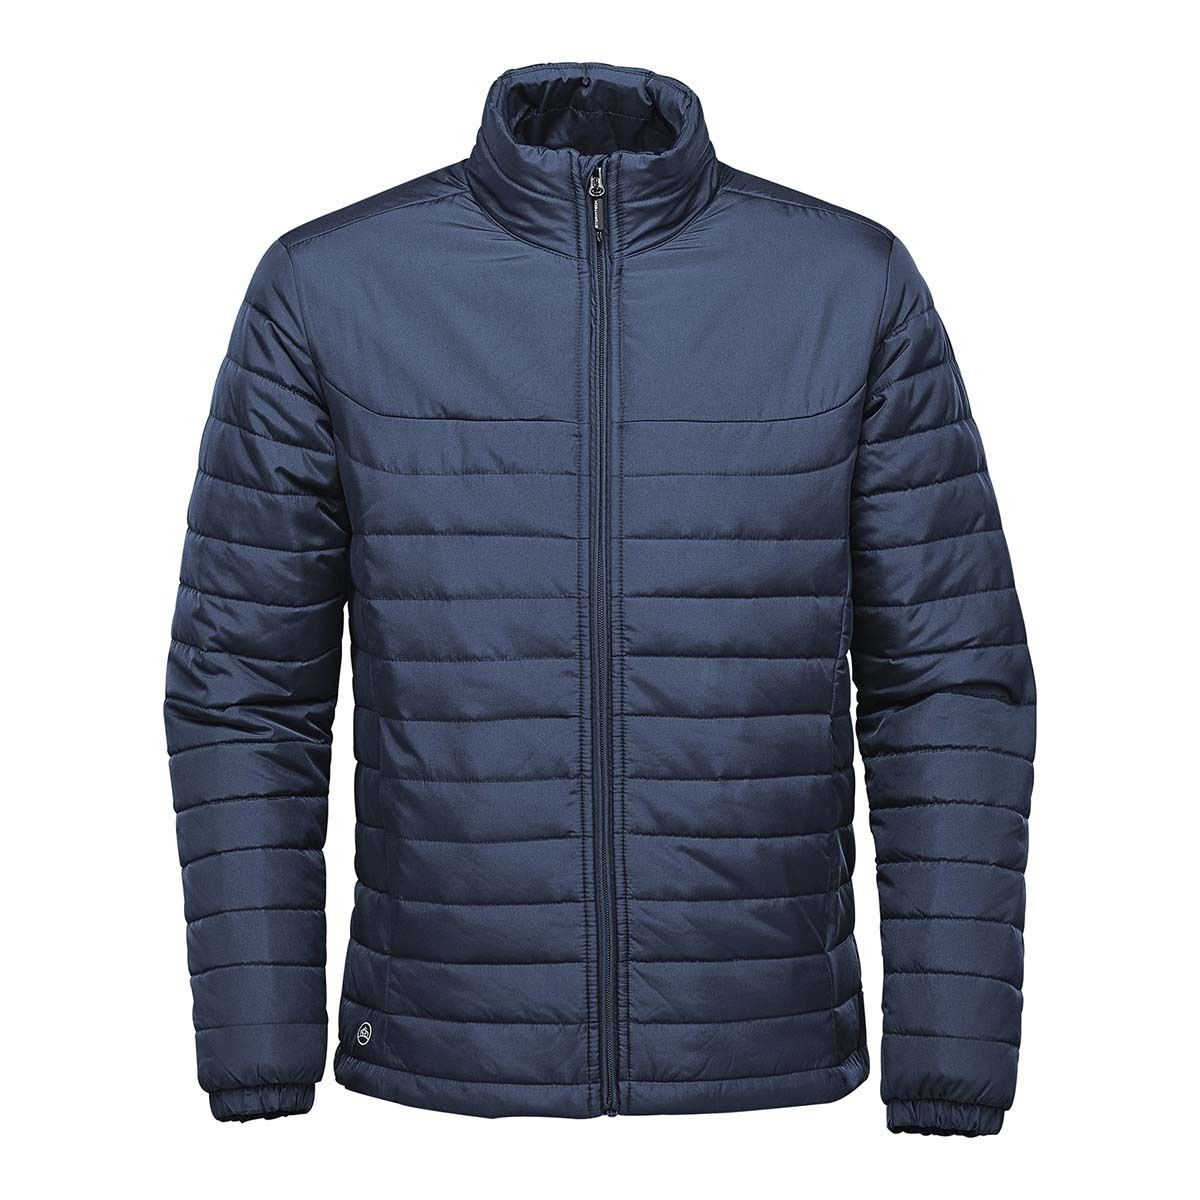 Nautilus Quilted Jacket